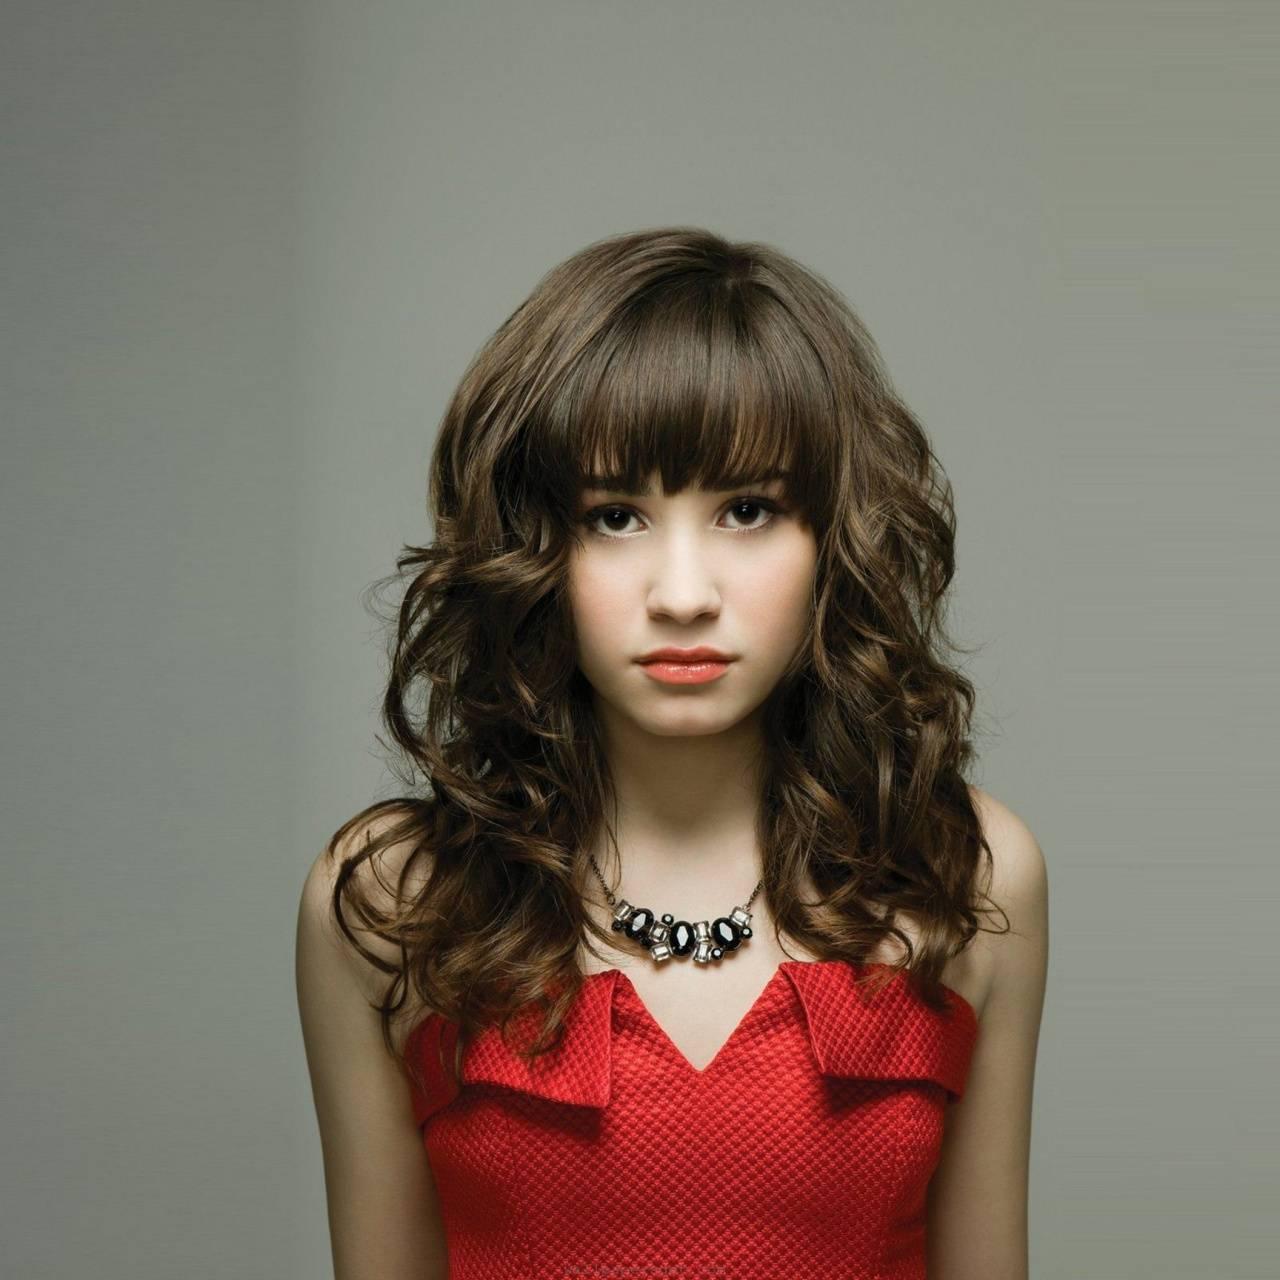 The Curly hair girl